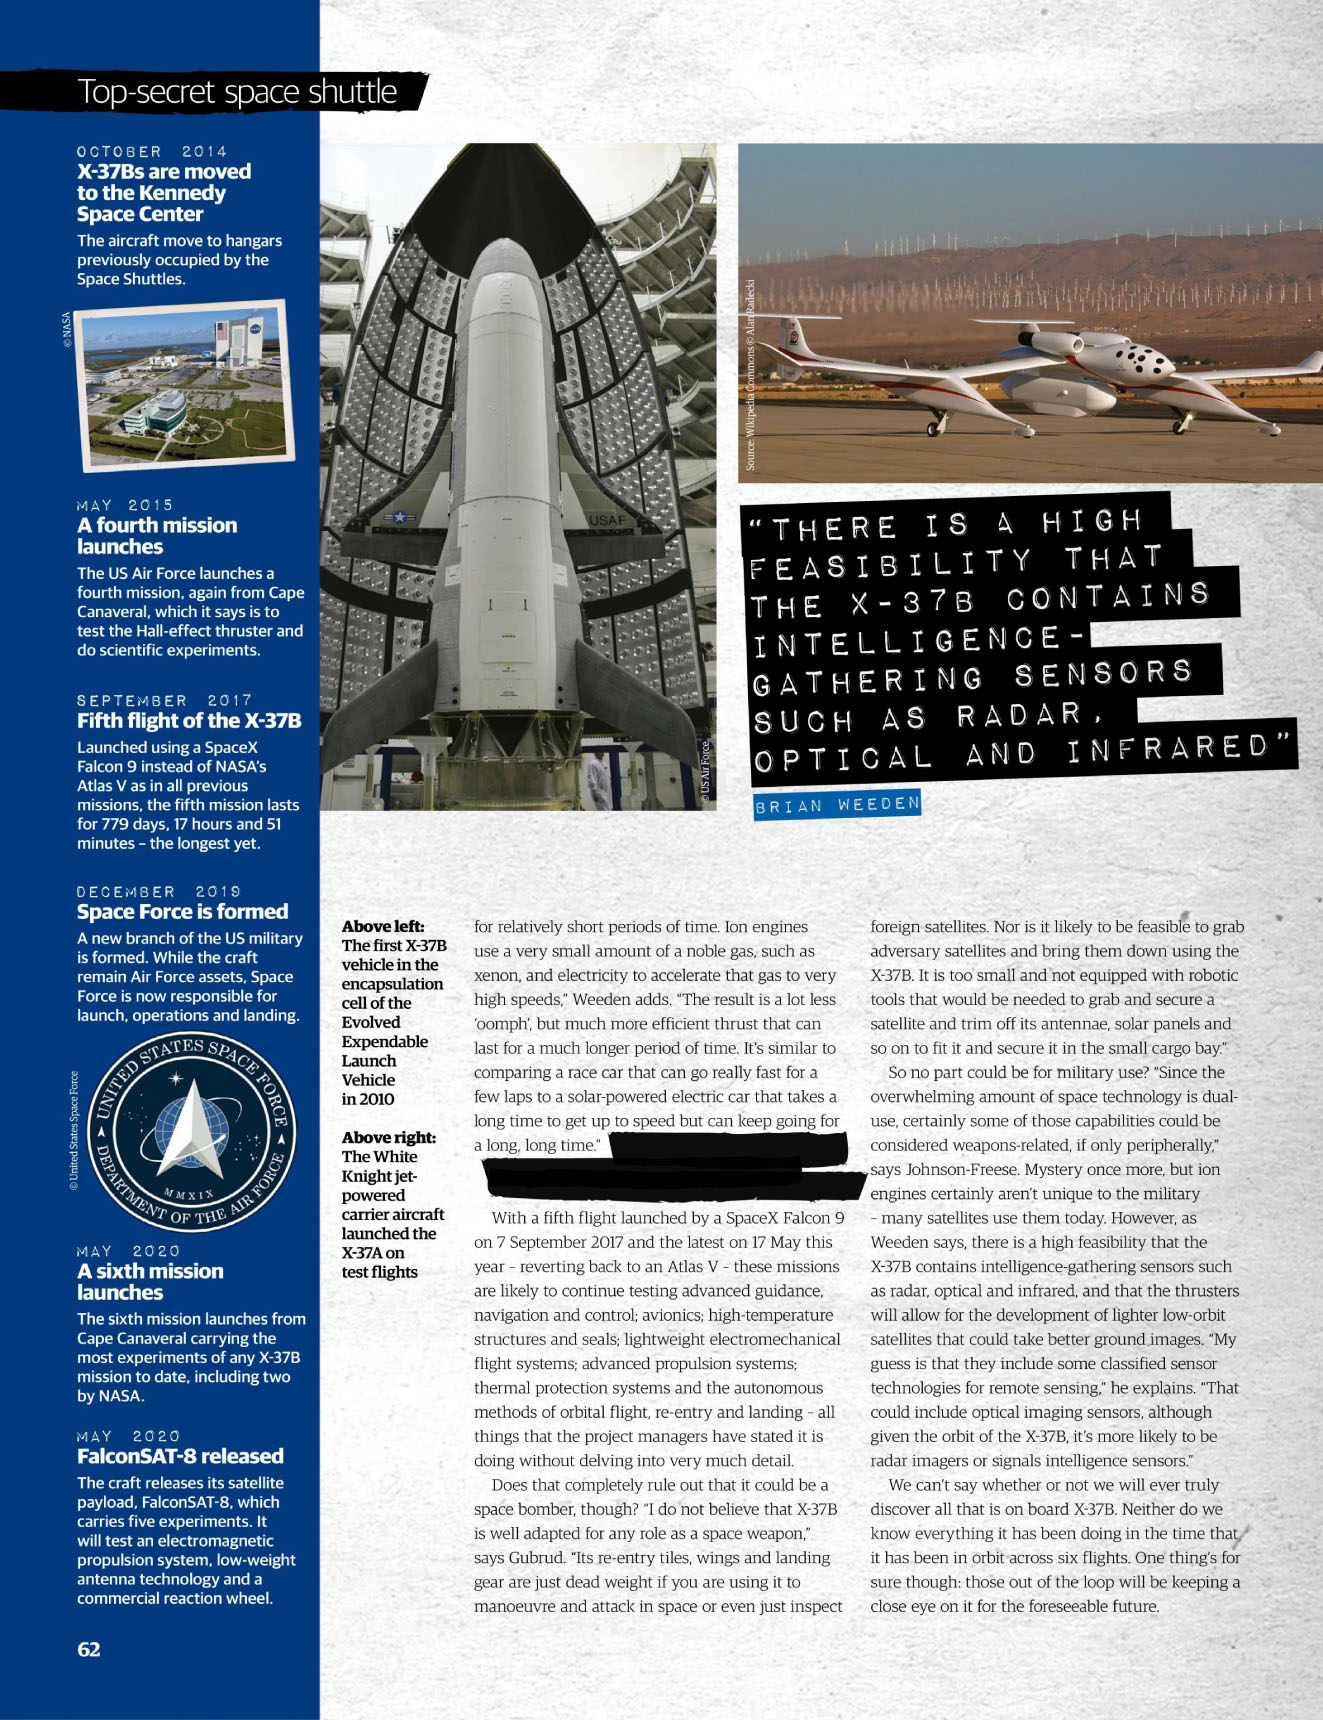 All About Space 107 2020 Secret Shuttle 05.jpg